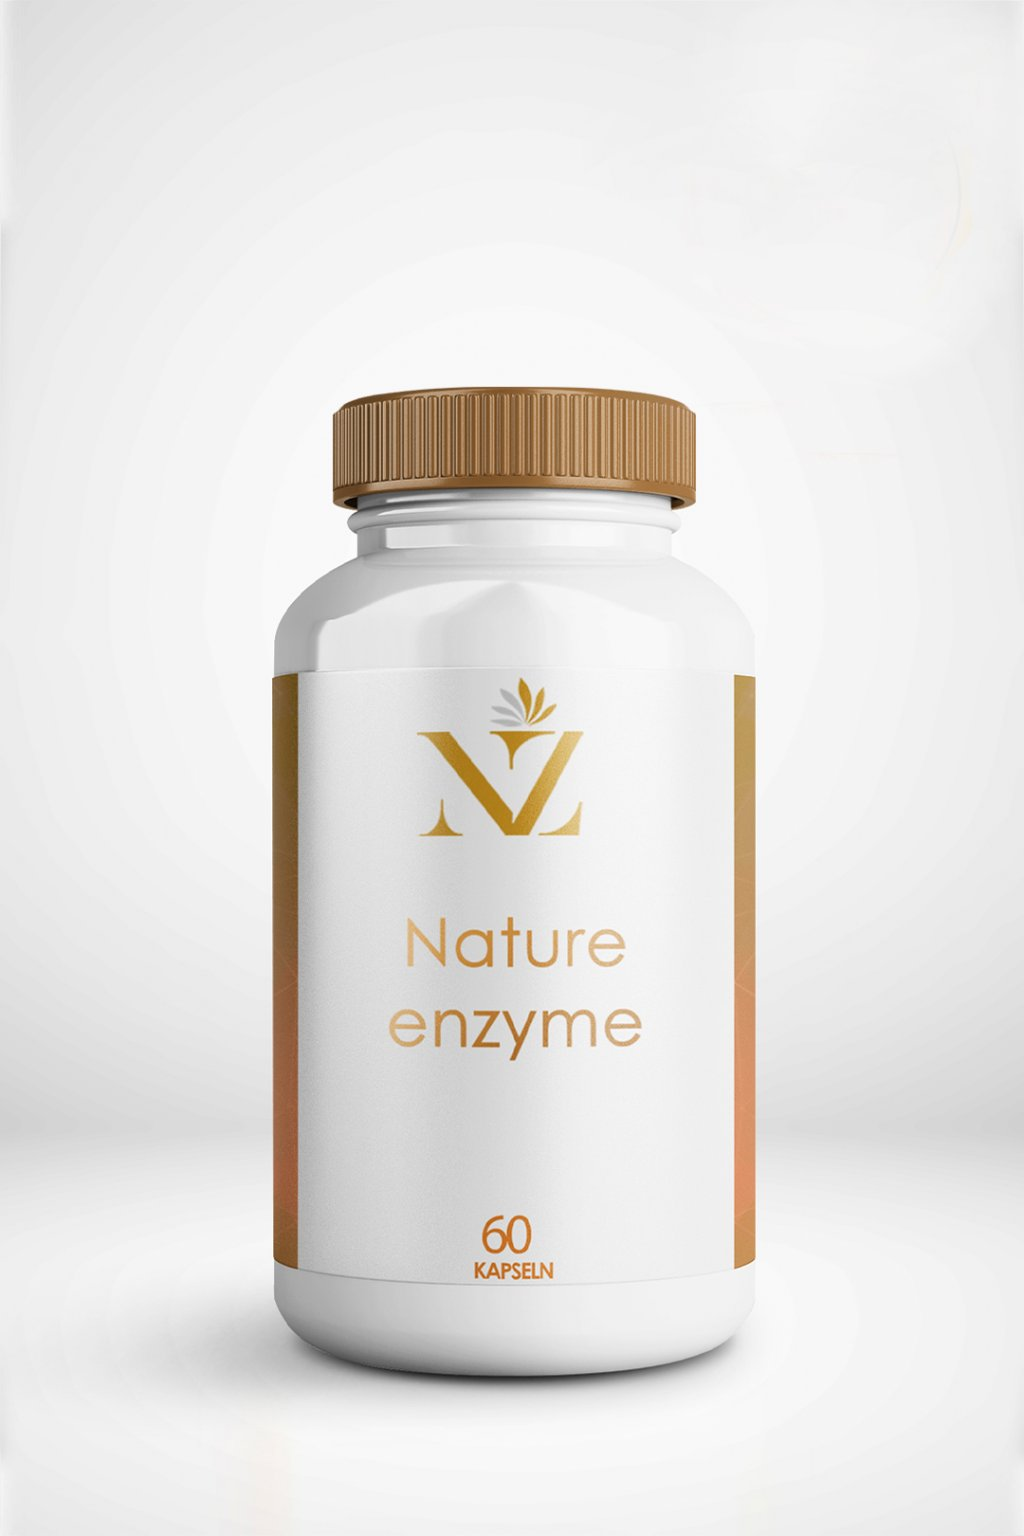 Nature enzyme emesztes naturalzen